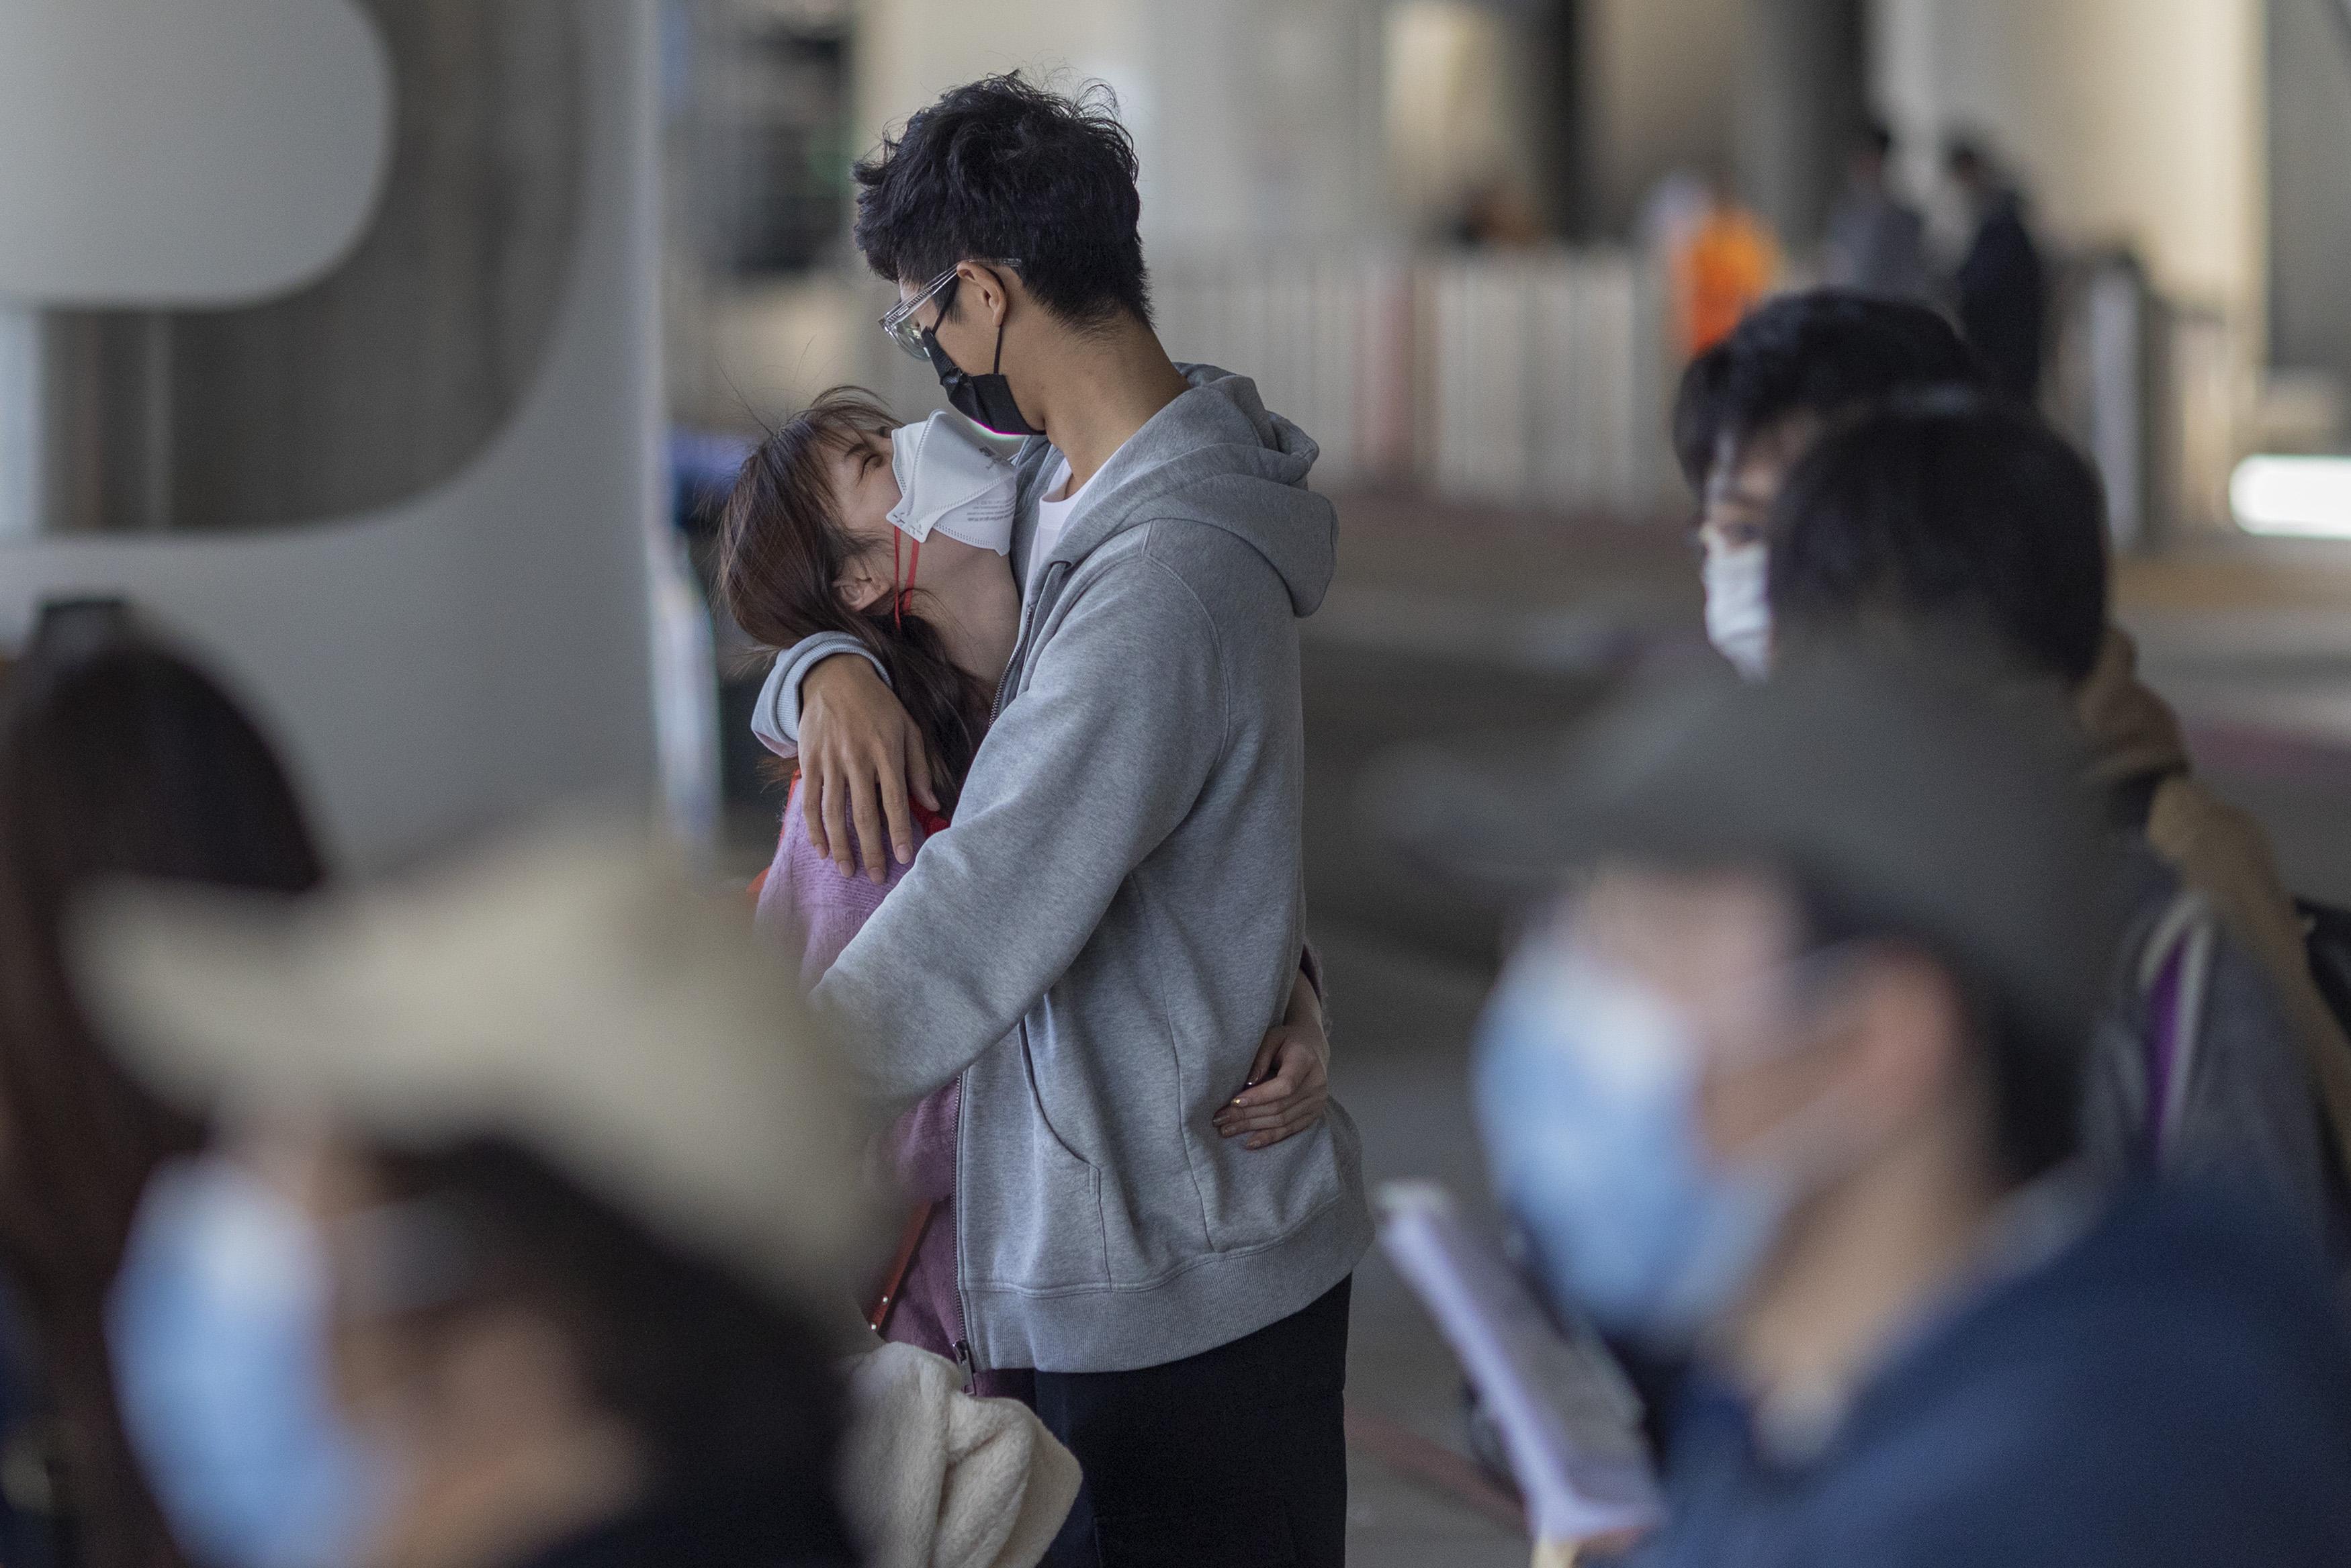 LA Community Leaders Worry Anti-Asian Racism is Being Fueled by Coronavirus Panic